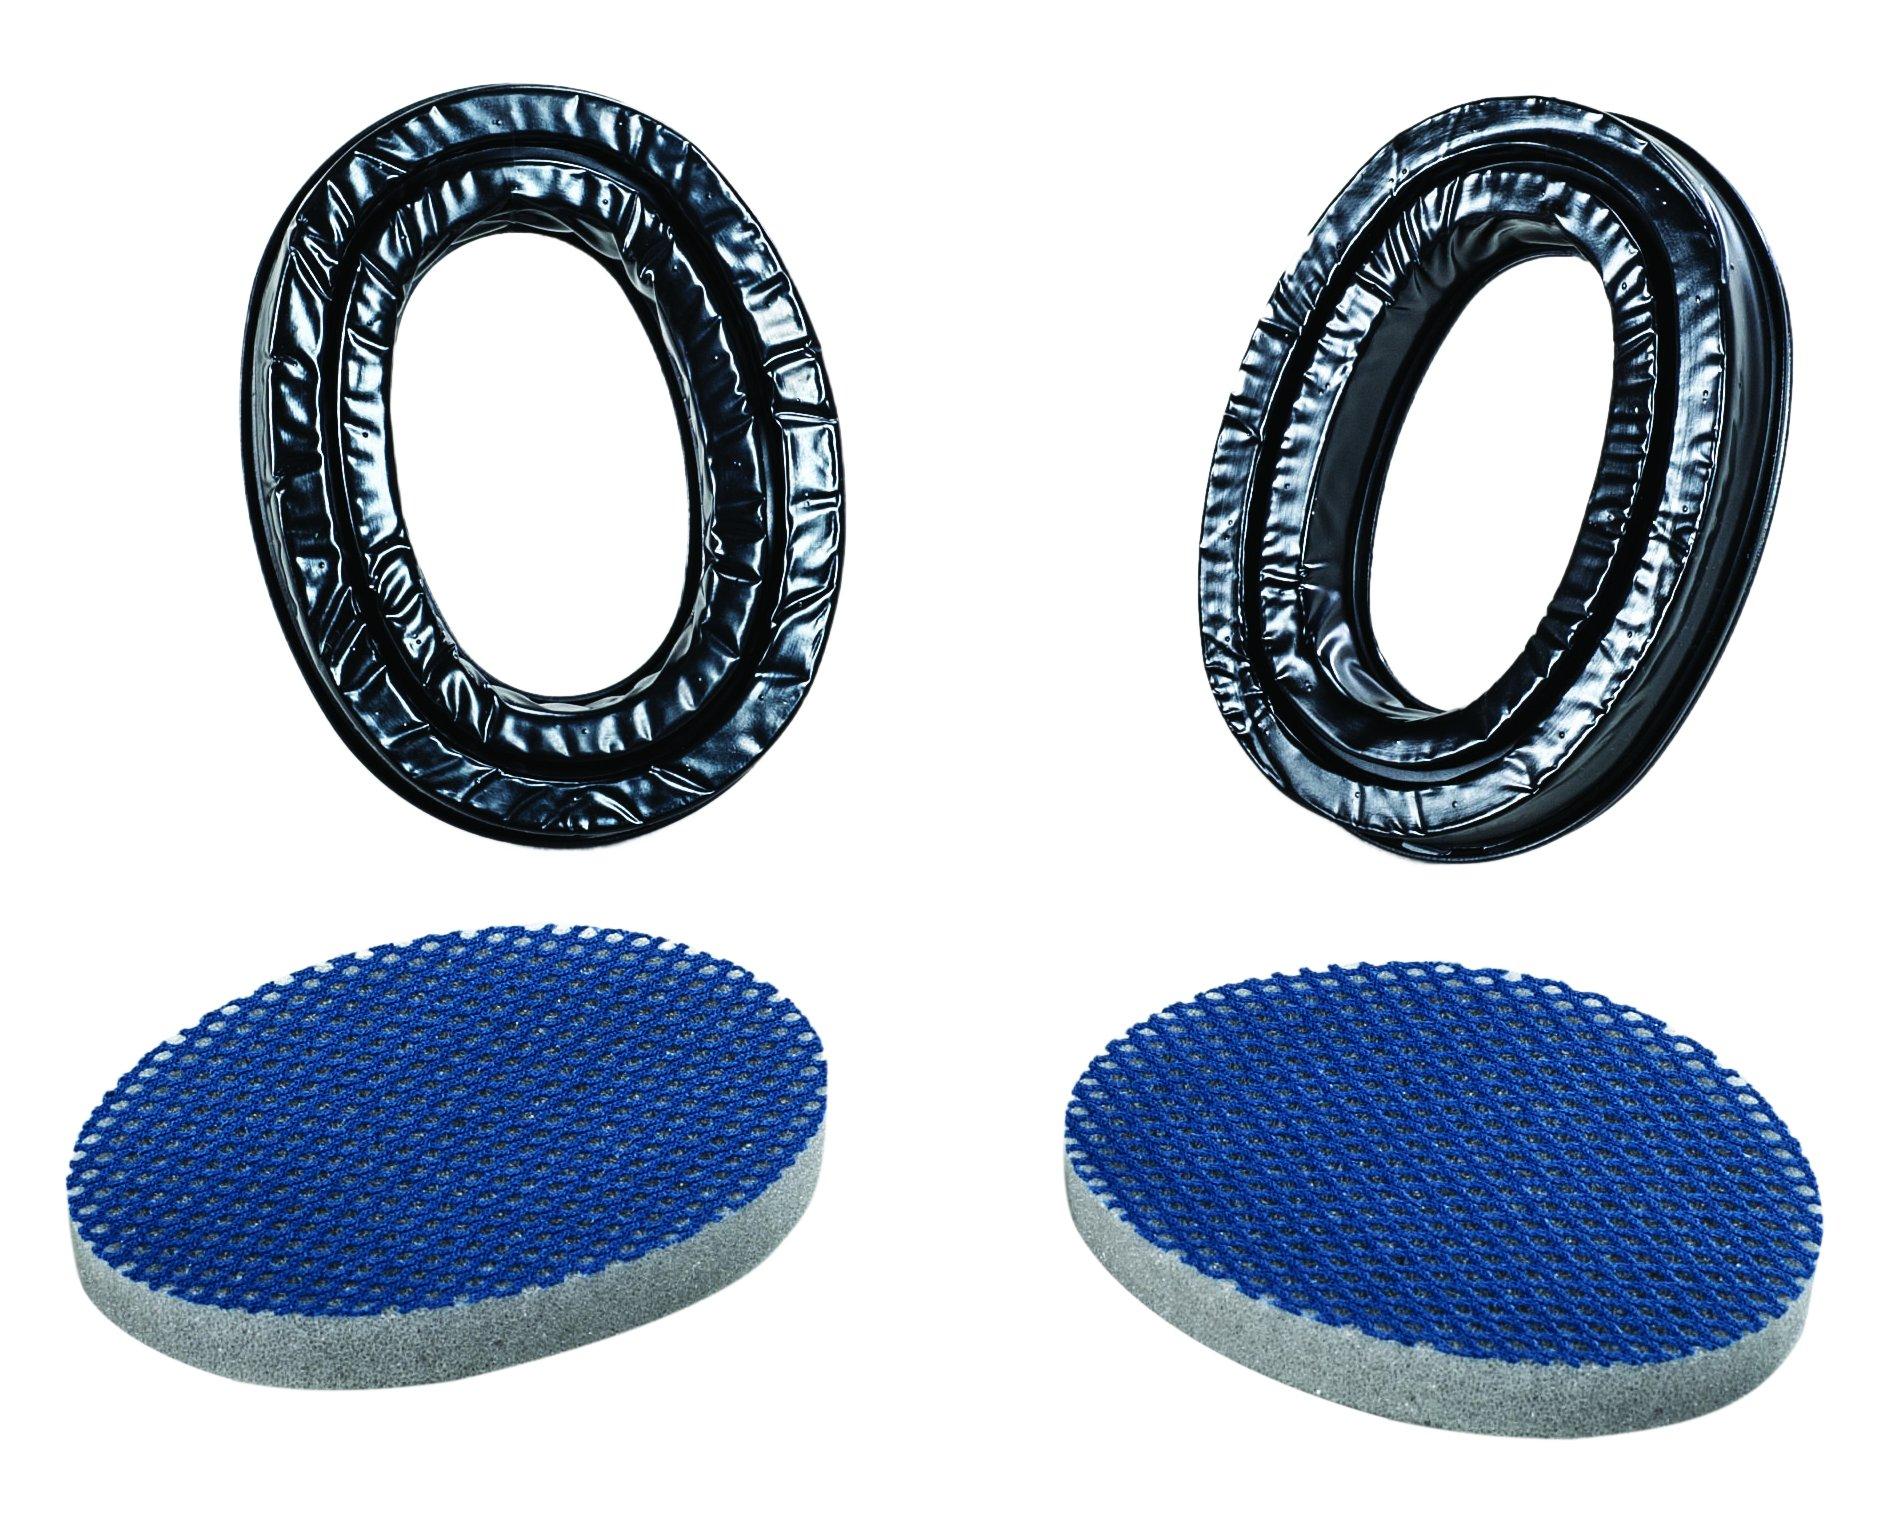 MSA 10082377 APR Hygiene Gel Kit, Ring (2), Sealing, SOR60092 by MSA